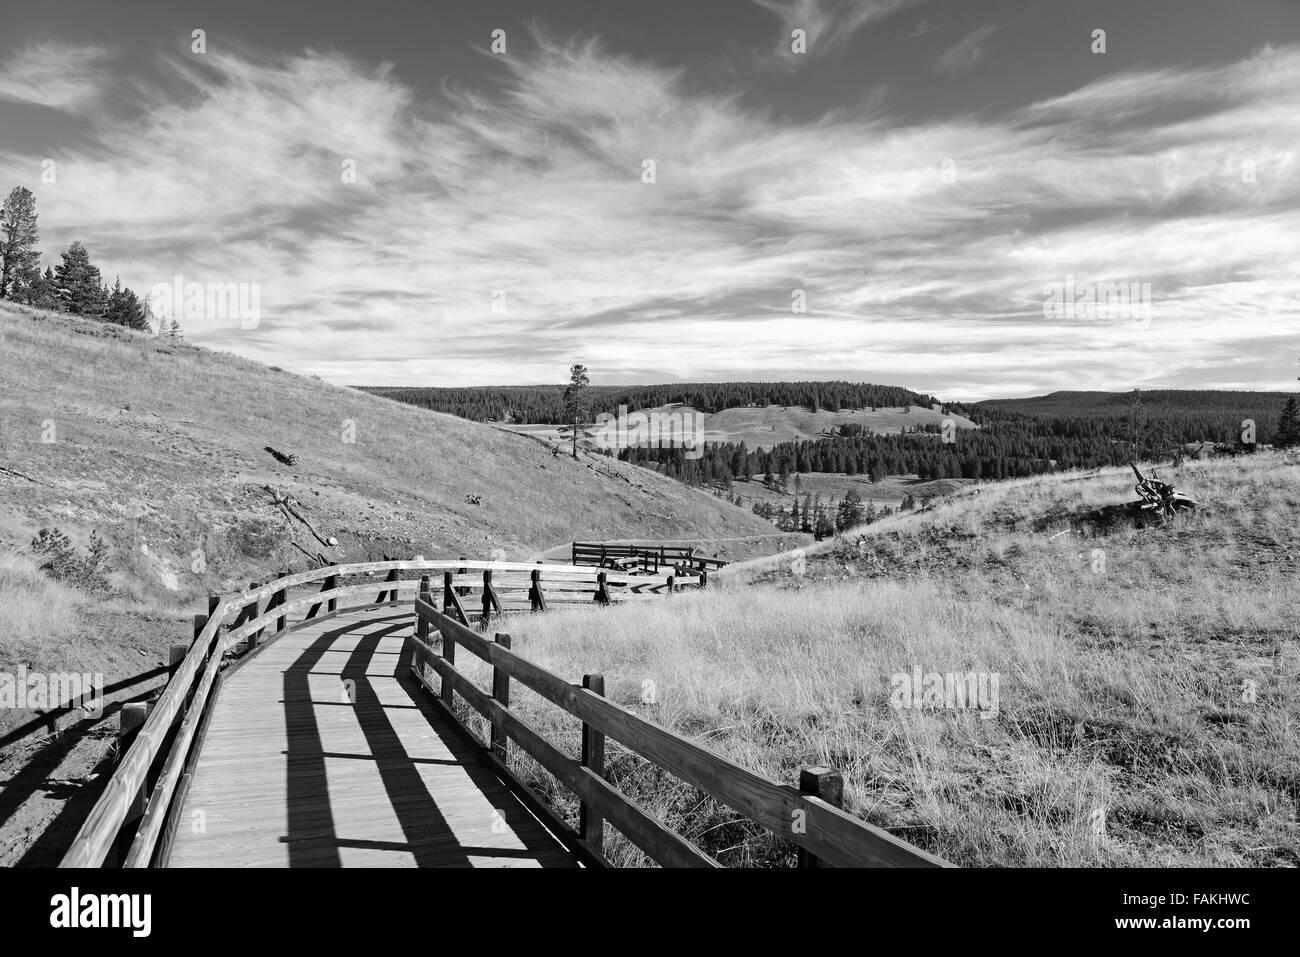 Yellowstone National Park, Wyoming, USA - Stock Image